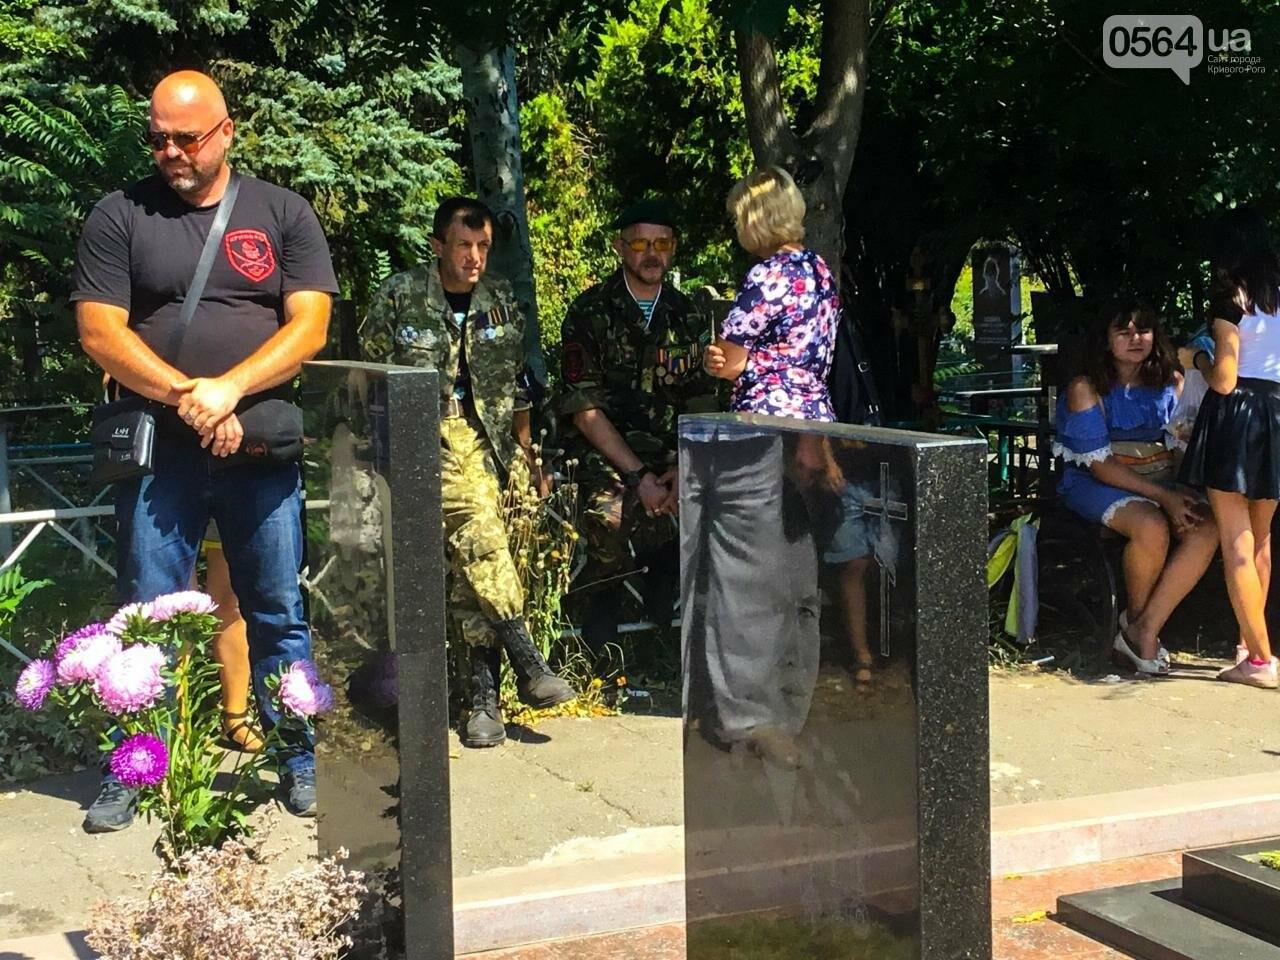 На Аллее Героев провели панихиду по погибшим в зоне АТО криворожанам, - ФОТО , фото-9